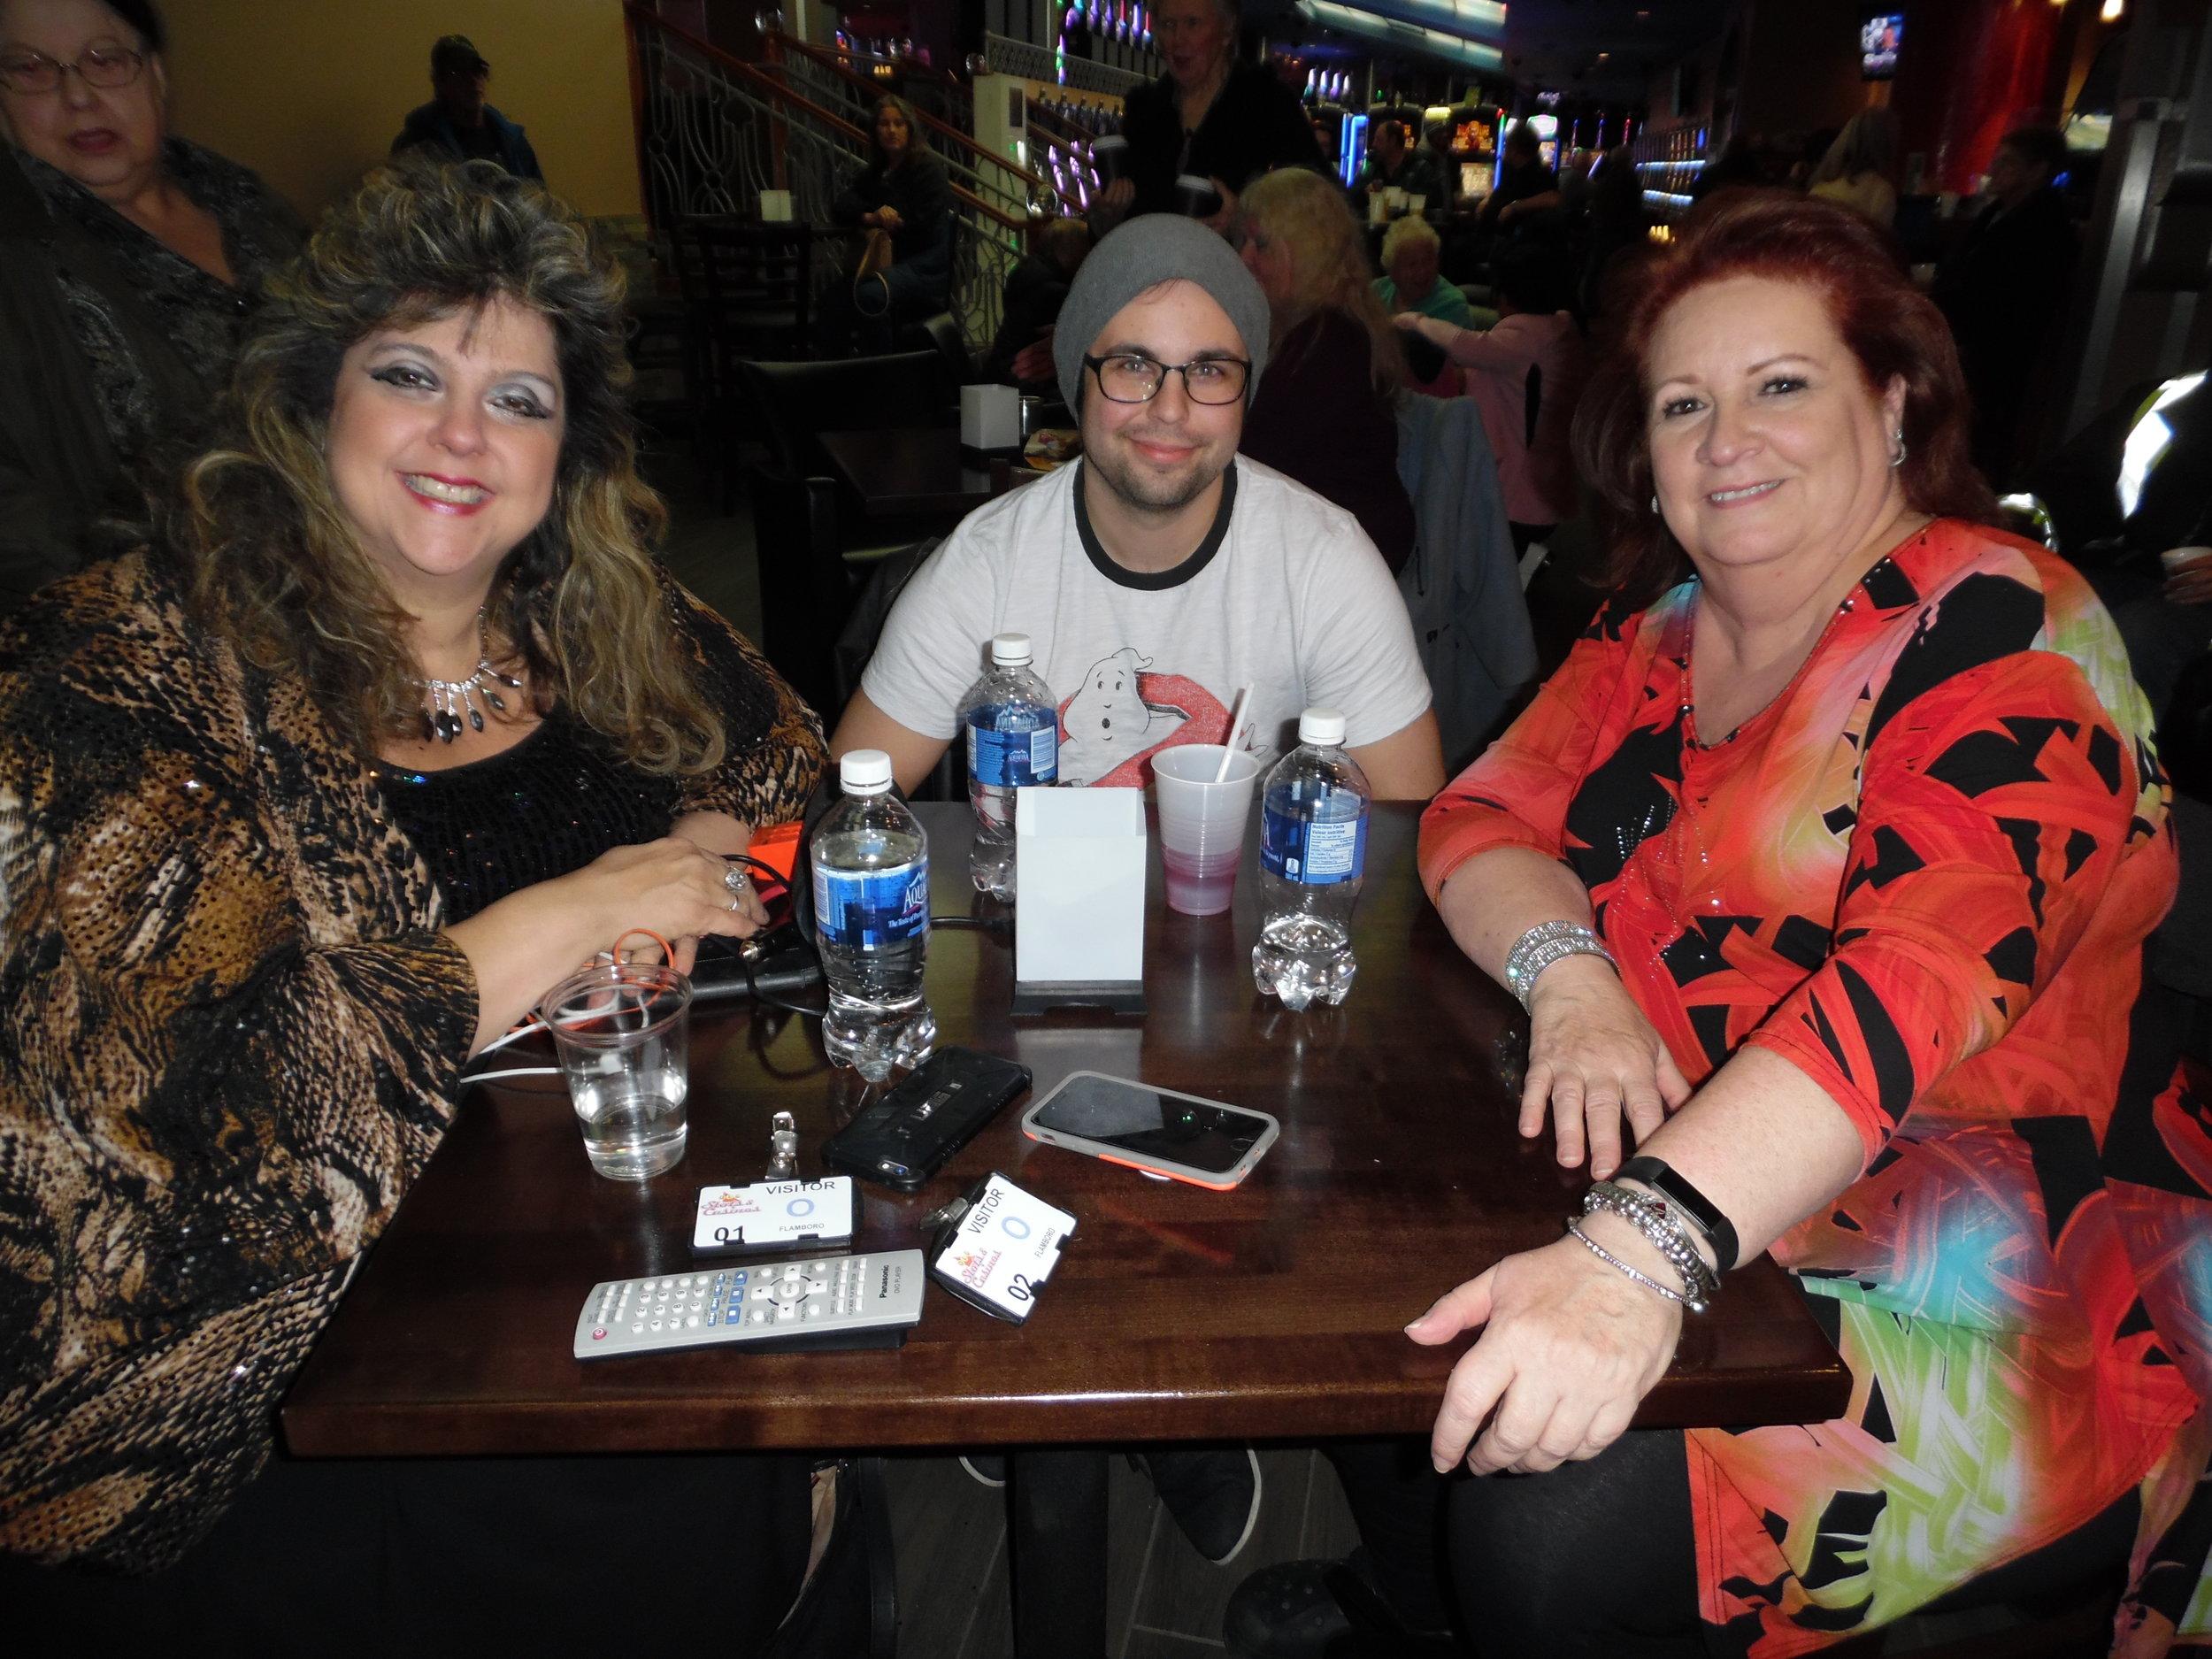 Sandra Gold, Josh Gibb, and Sue Harris, and Lisa Gibb (not pictured) were at Flamboro Downs for ETA  James Gibb 's wonderful show.